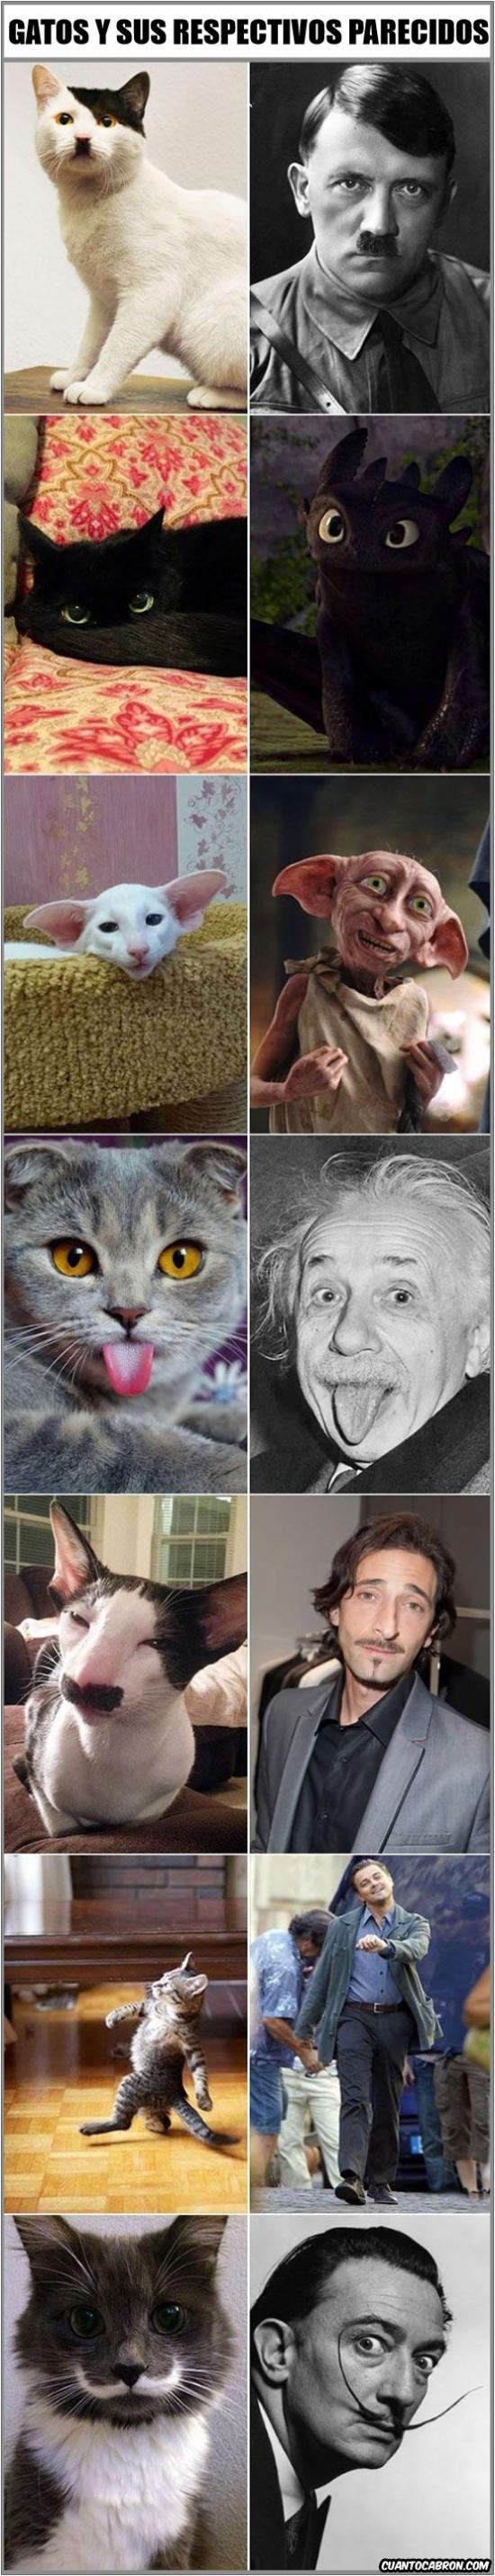 Otros - Gatos vs celebridades